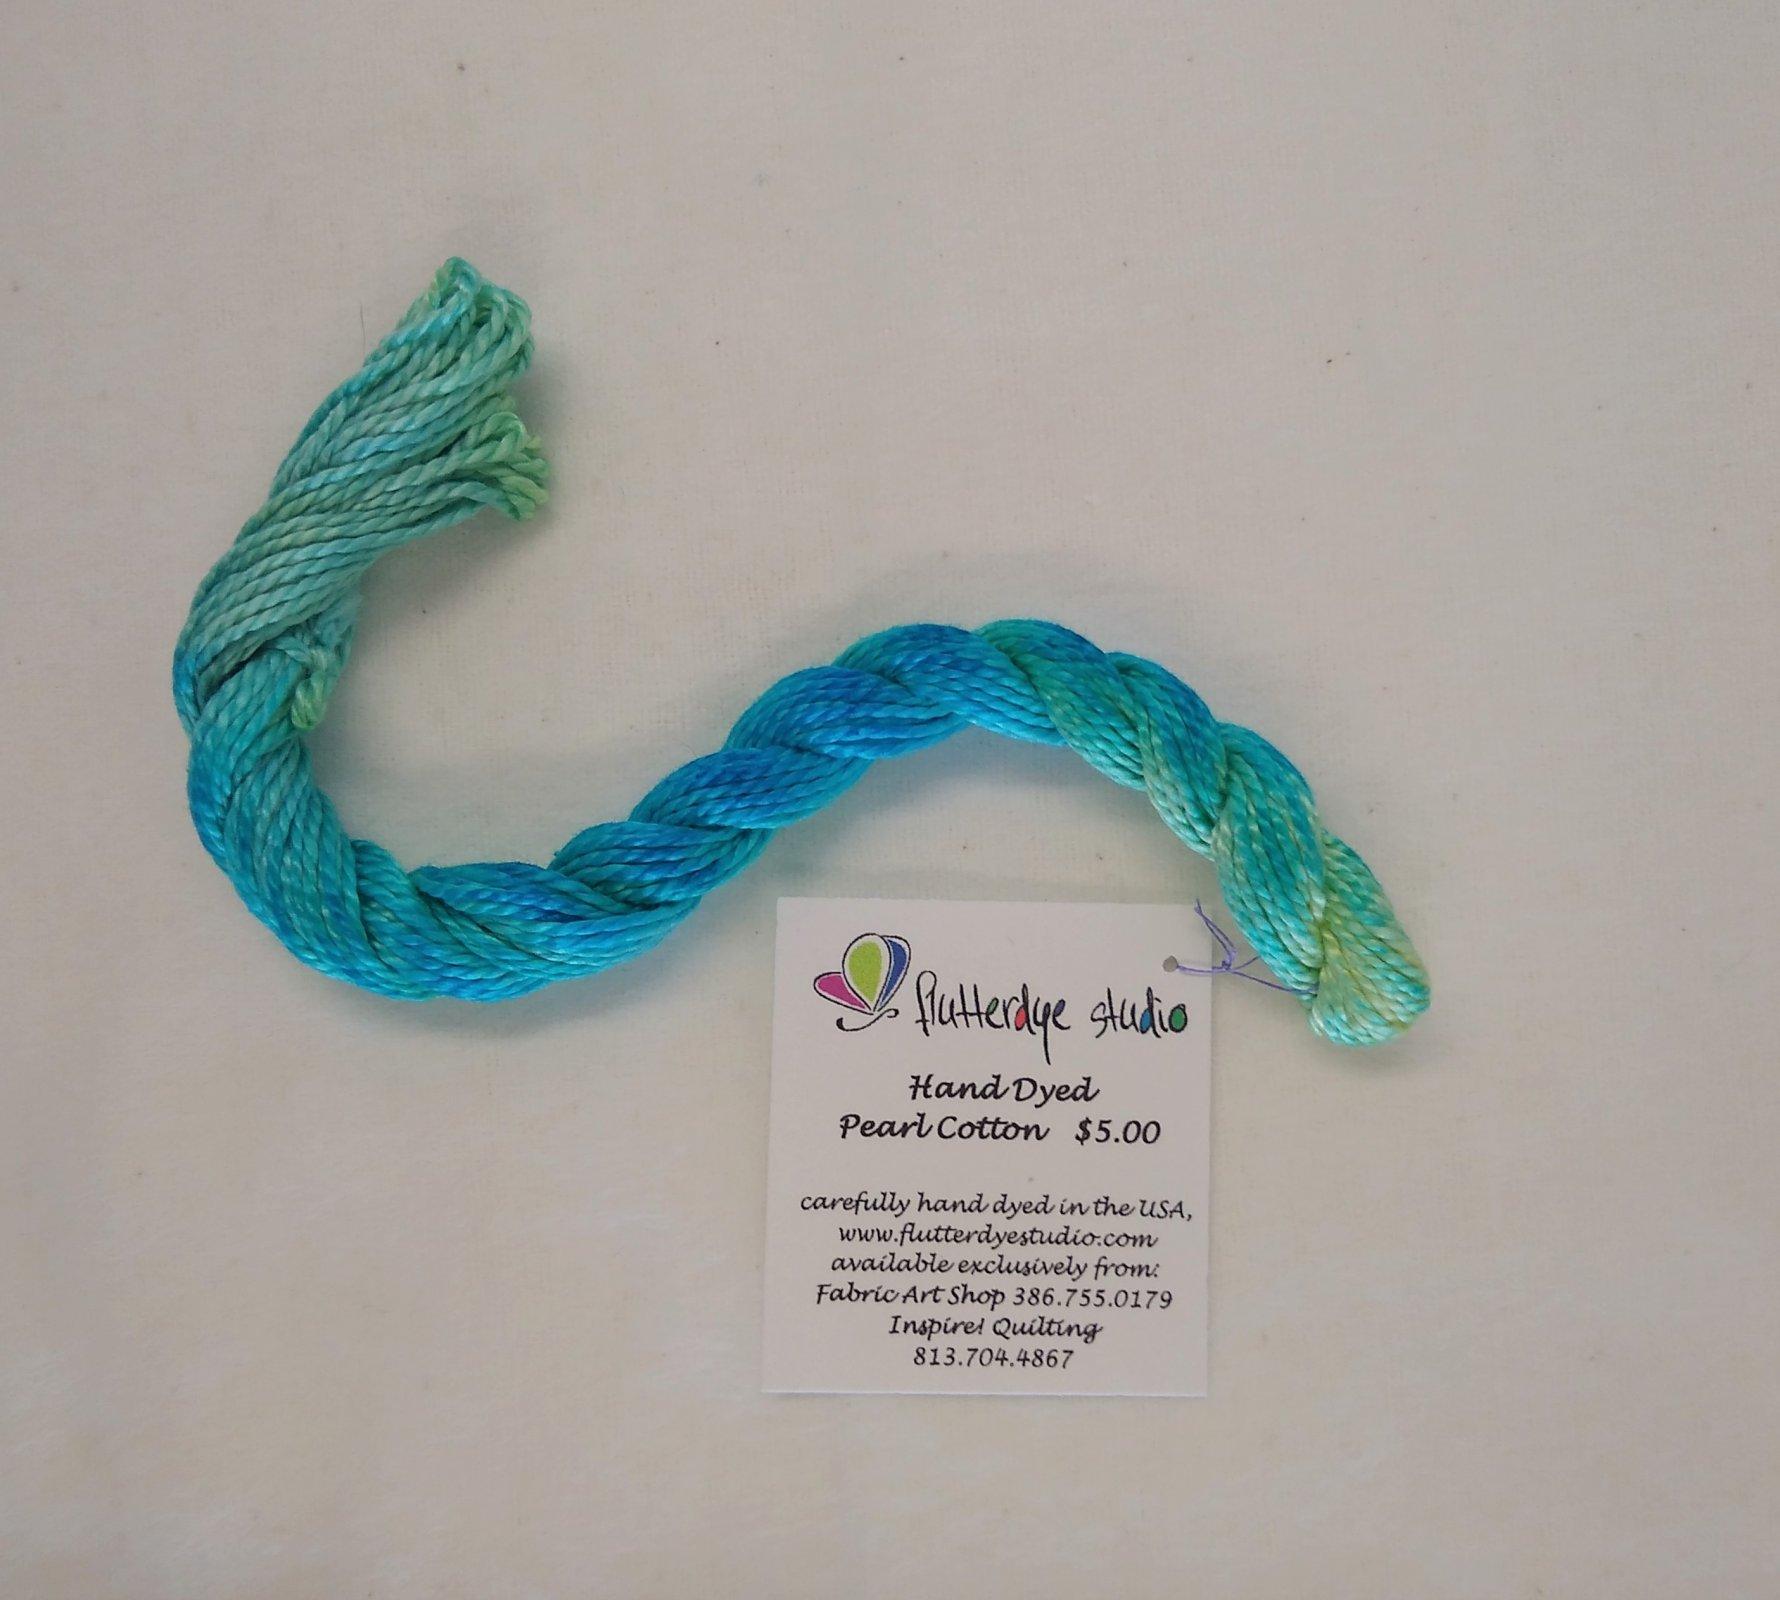 Flutterdye Studio - Hand Dyed Pearl Cotton - 8wt - Varigated - 15 yds/ 13.7 m